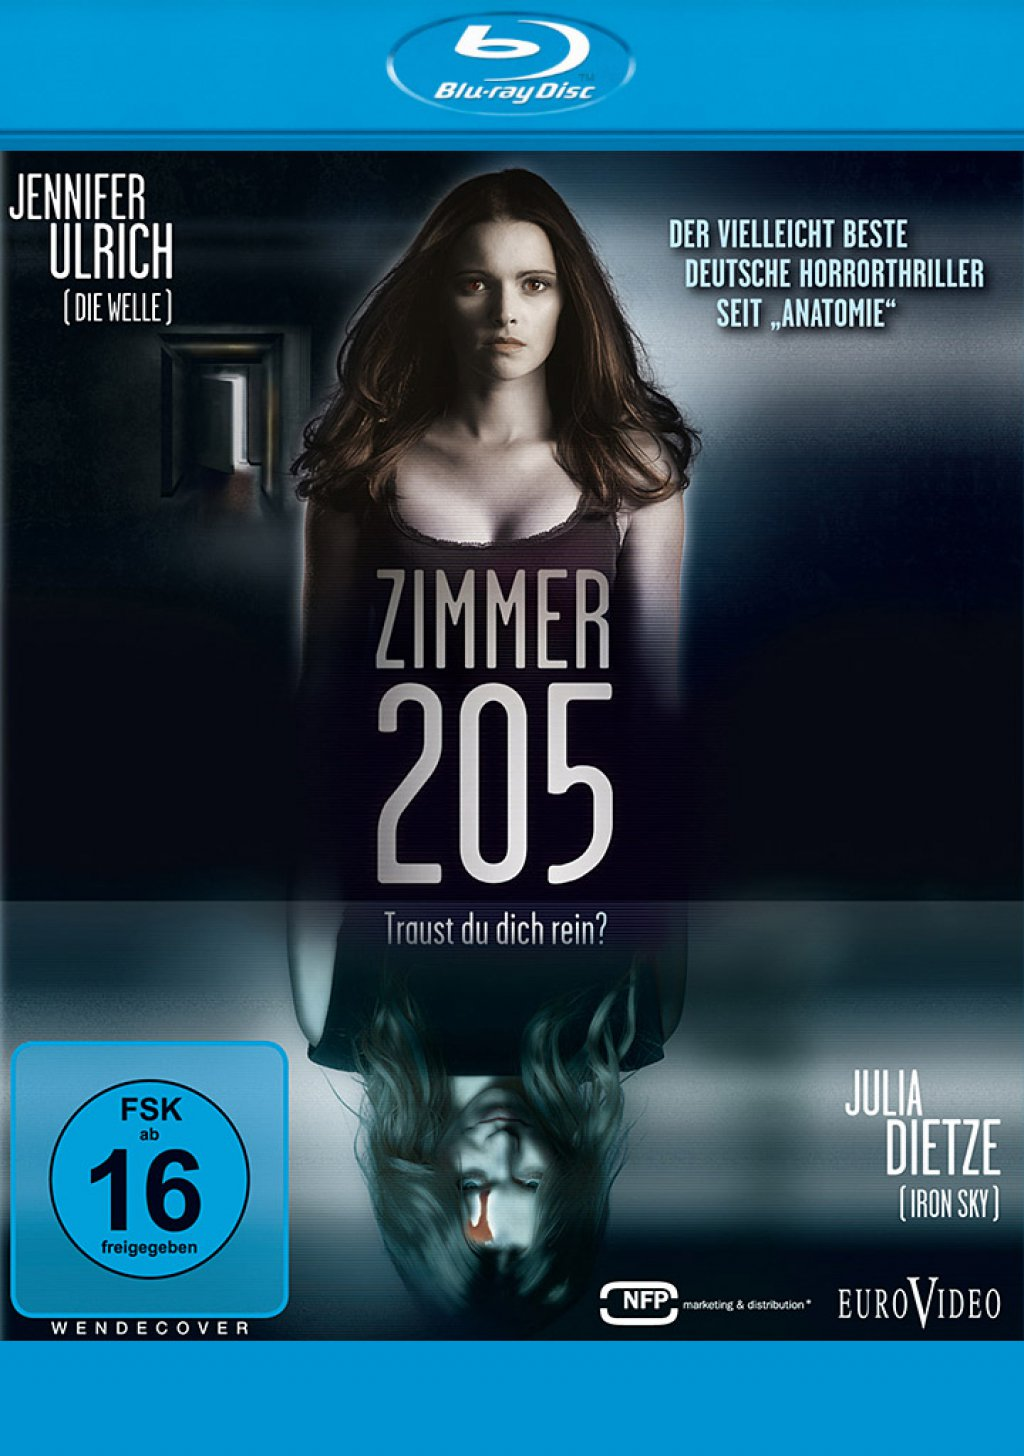 Zimmer 205 - Traust du dich rein? (Blu-ray)